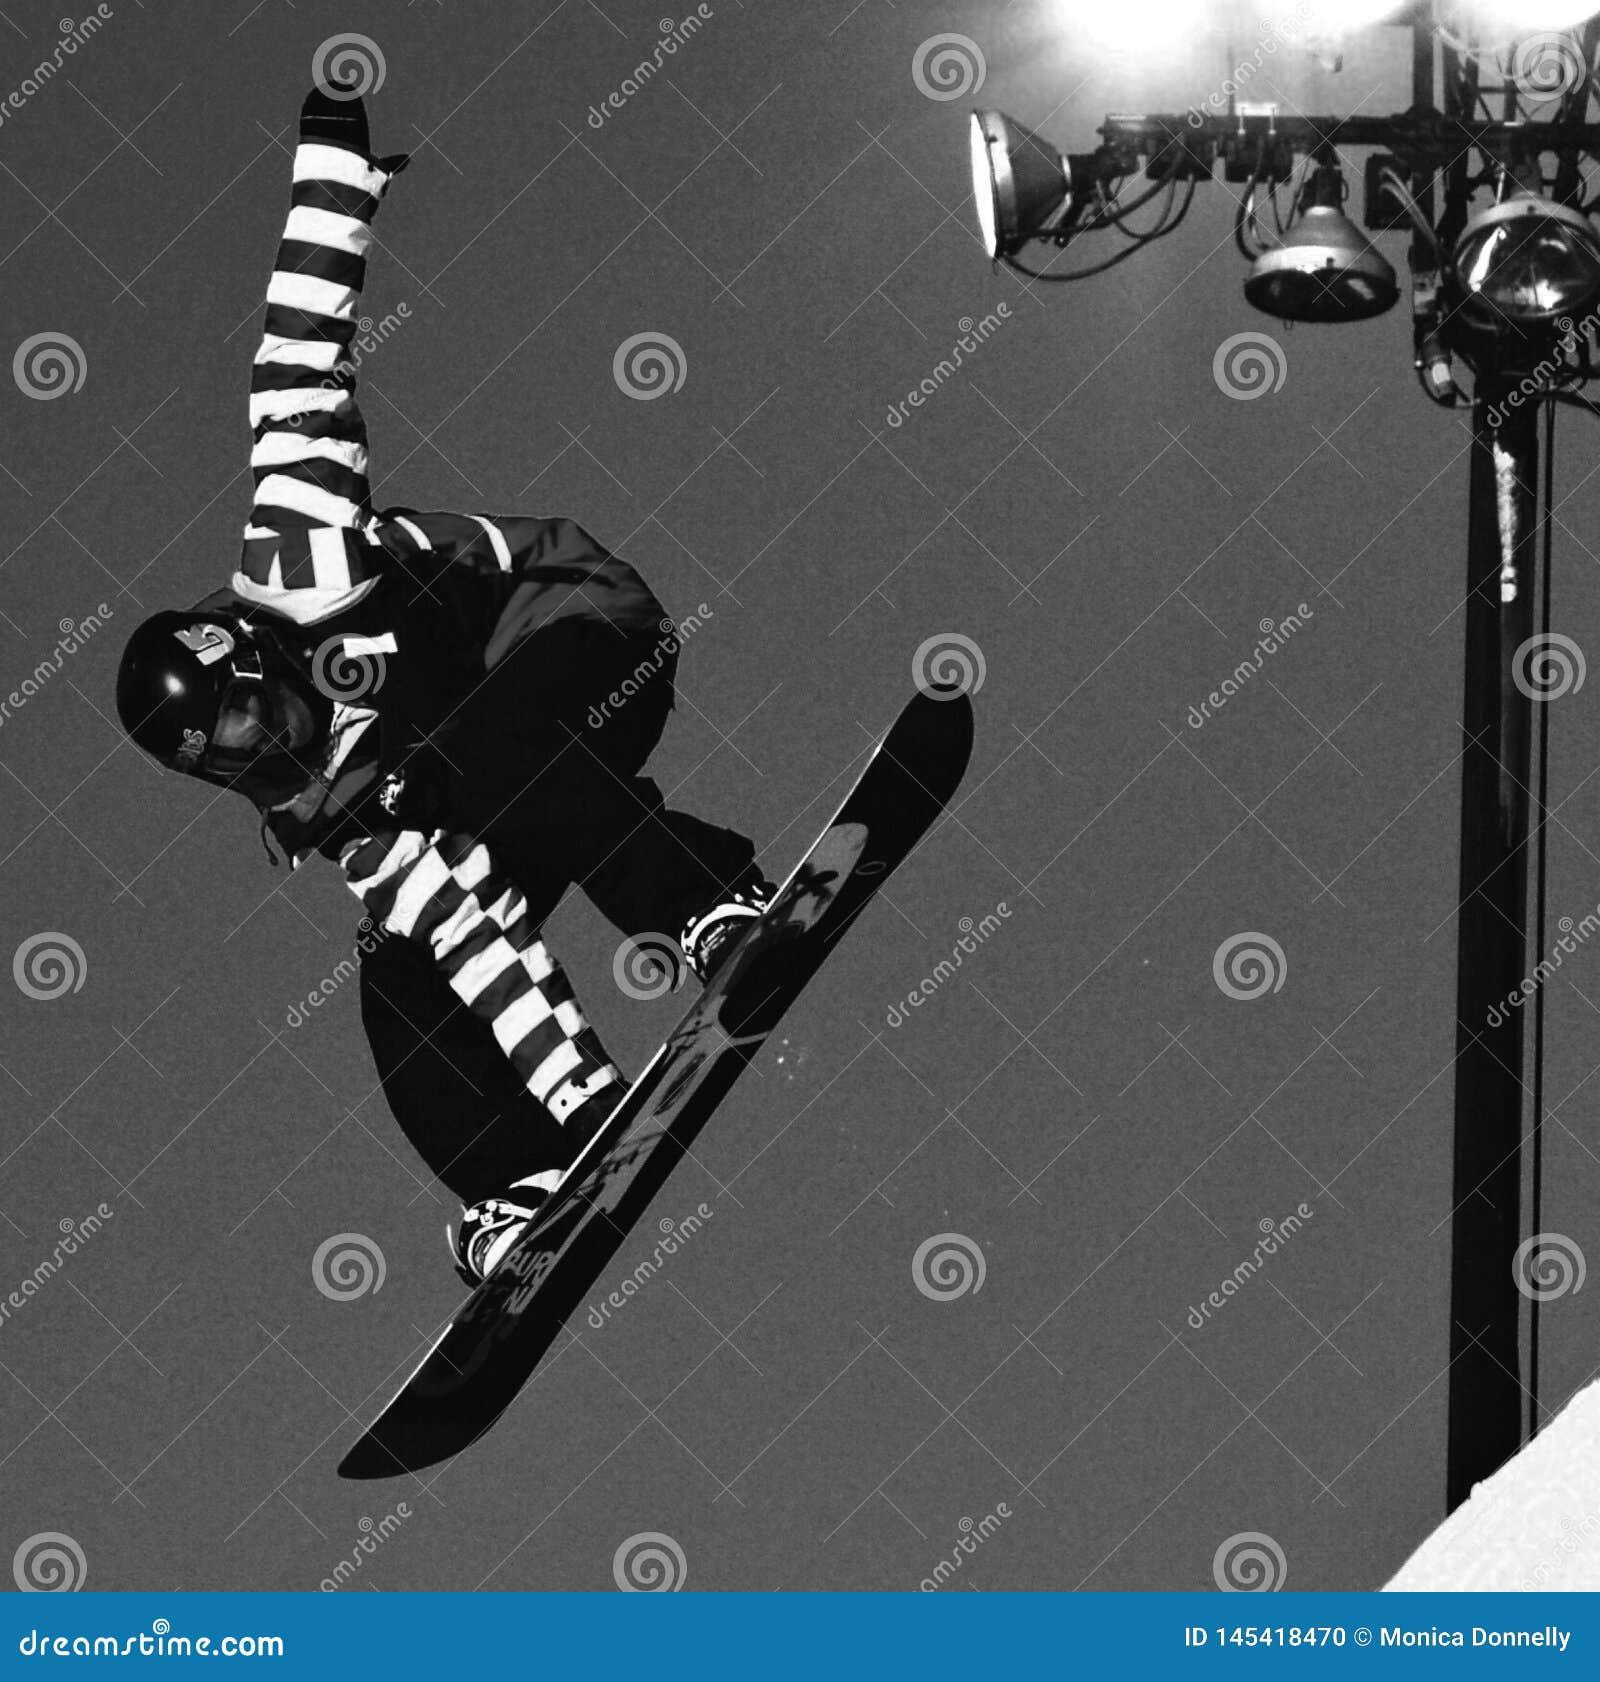 Snowboarding on a halfpipe